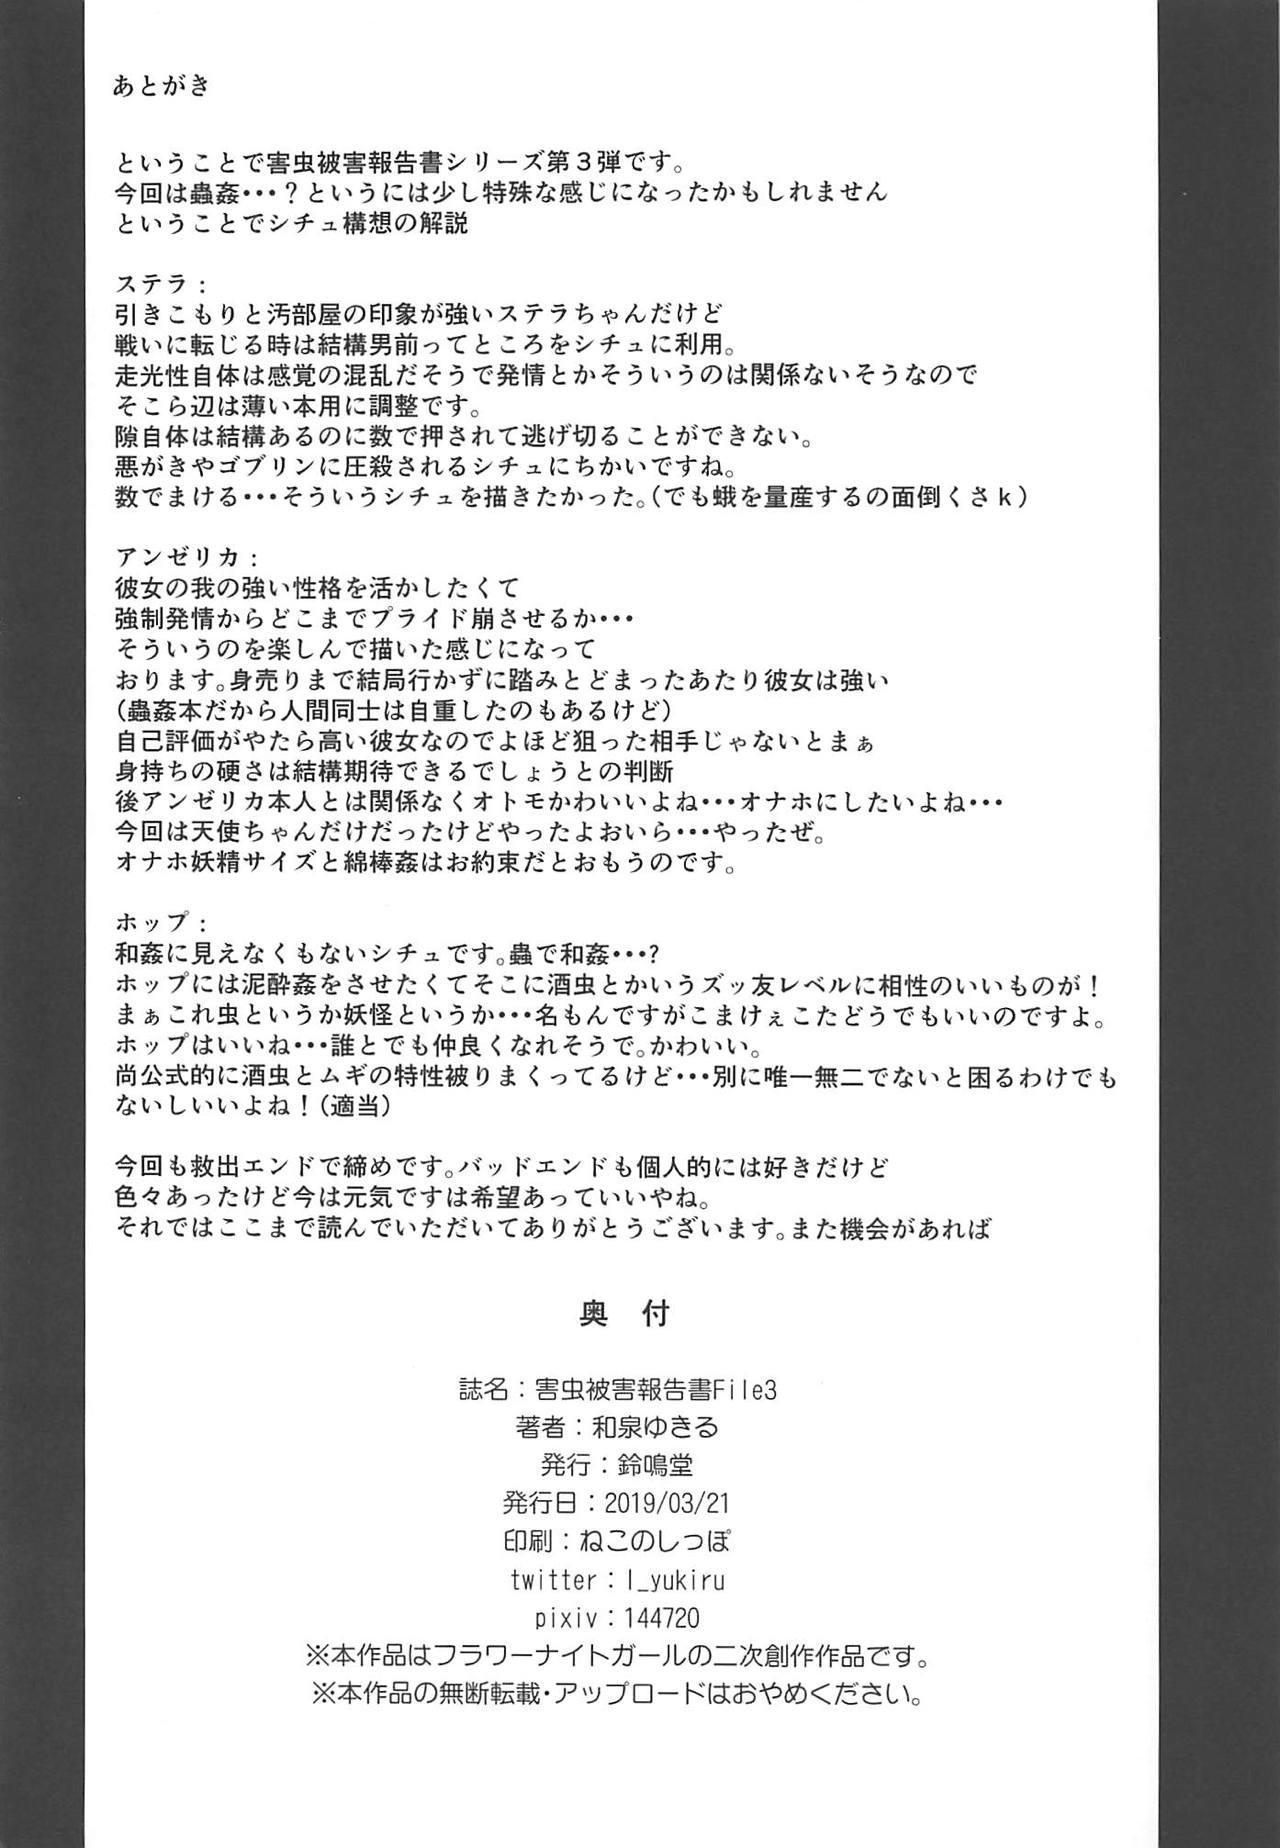 Gaichuu Higai Houkokusho File 3 28